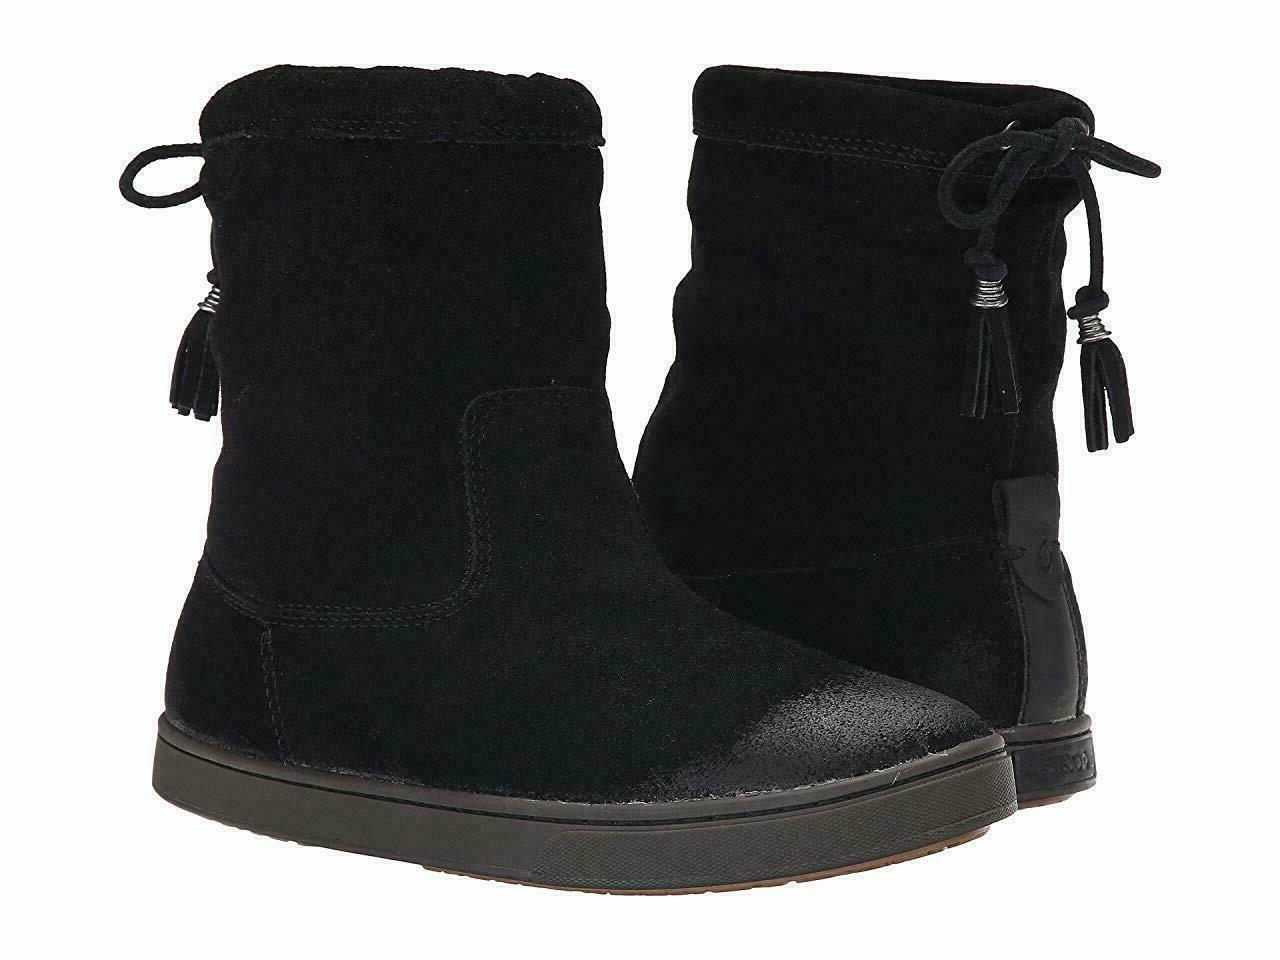 kapa moe boots new women s size